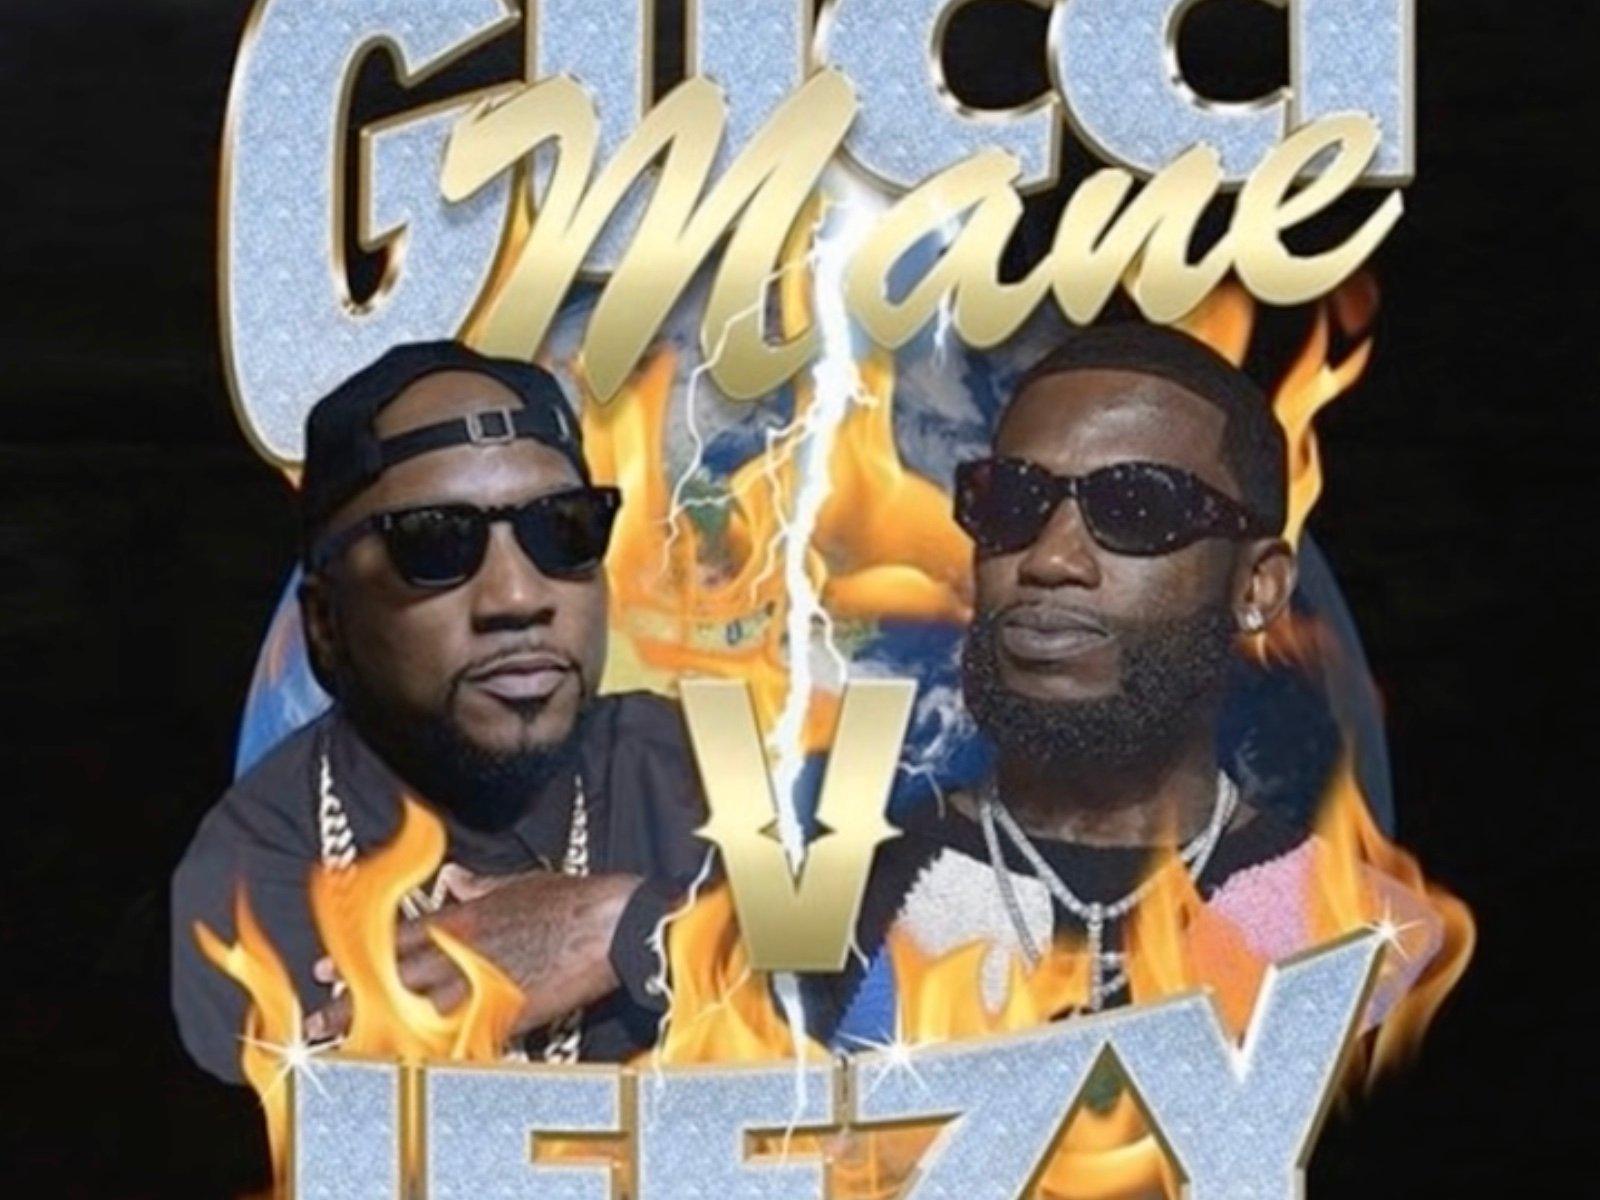 Here's The Gucci Mane Vs Jeezy Pre-Verzuz Playlist